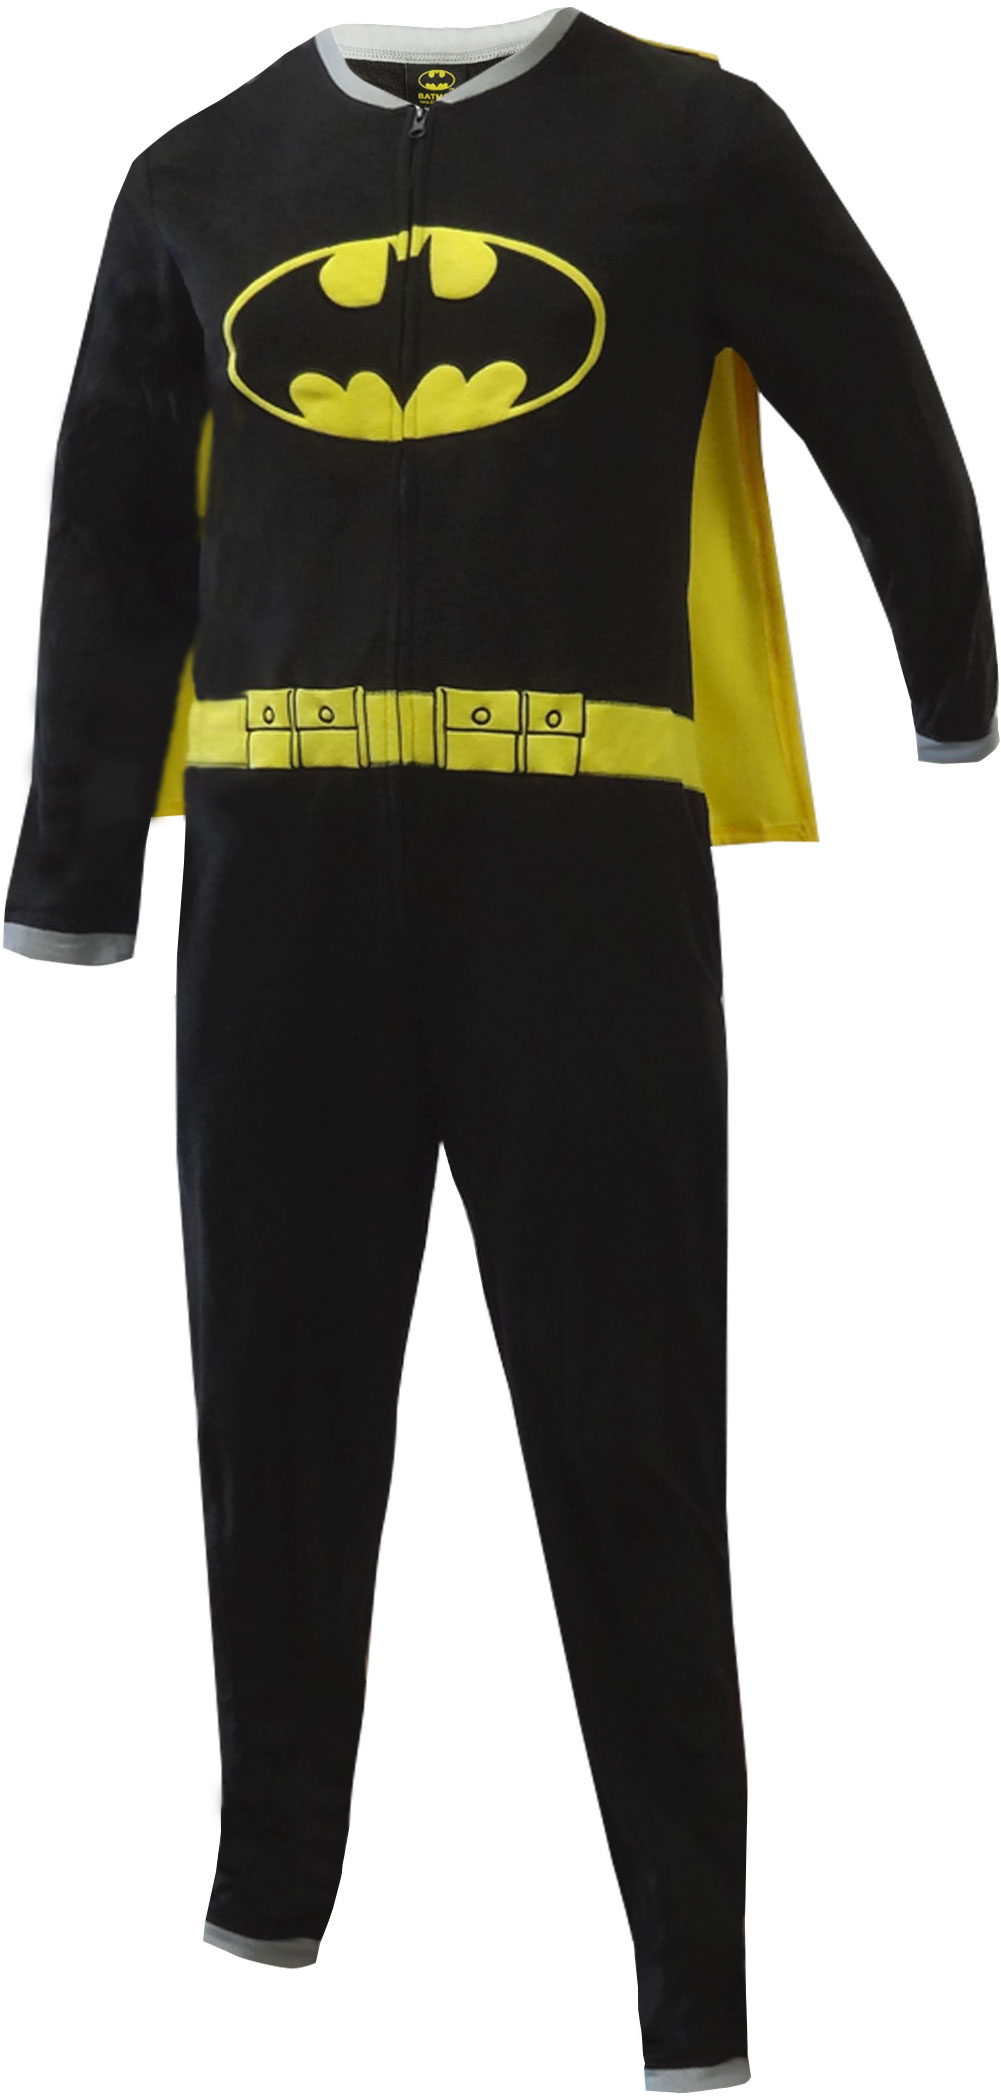 Batman One Piece Fleece Pajama with Cape by Bioworld Merchandising